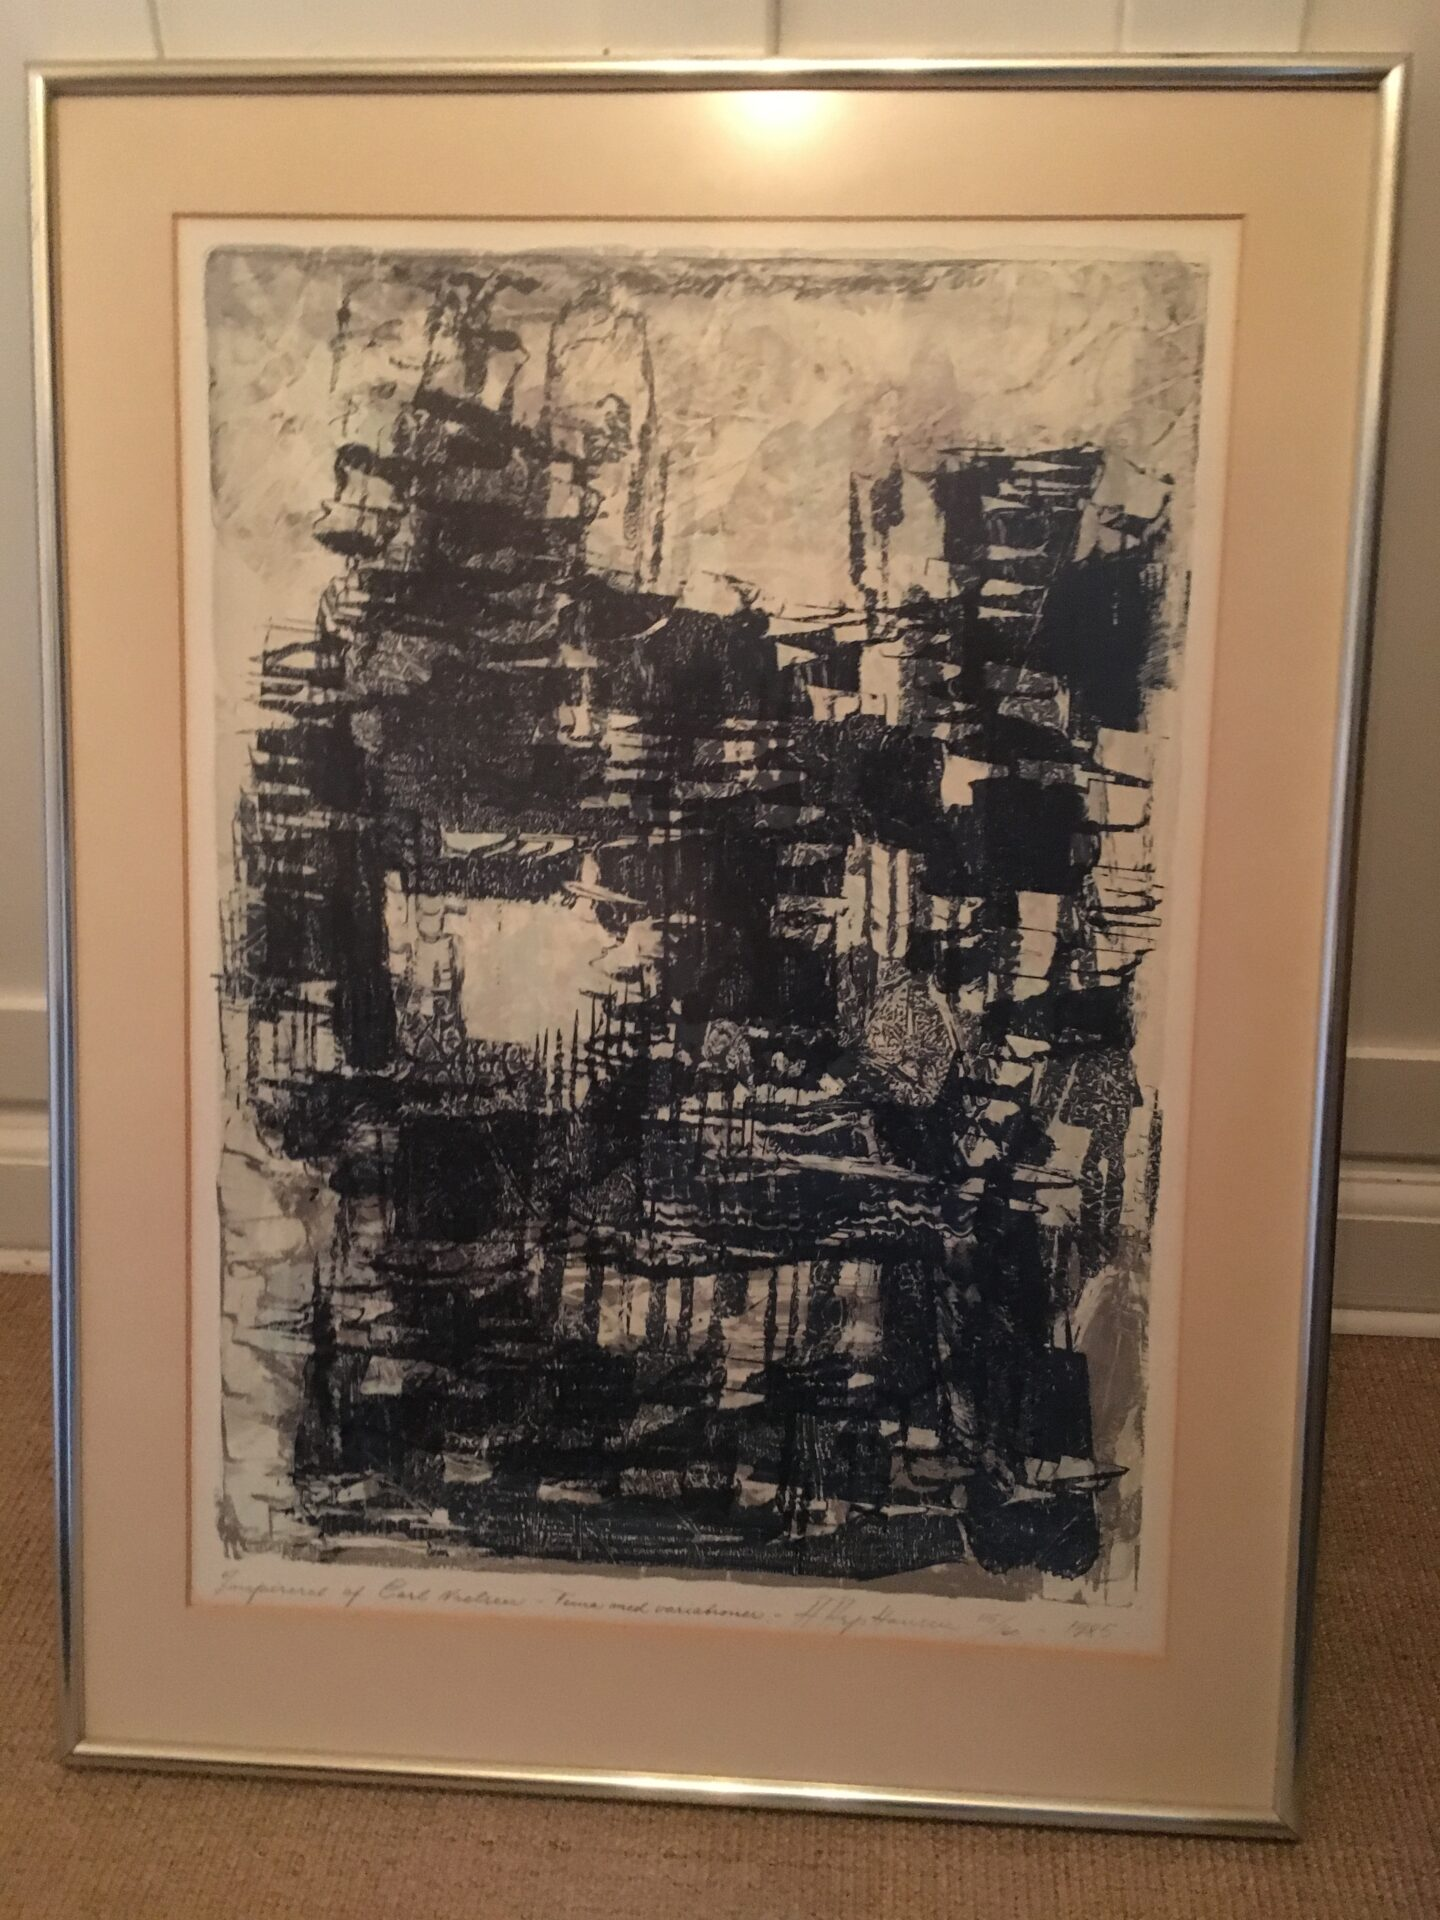 Litografi, A. Asp hansen, nr. 115/160 signeret i 1985, rammemål 65x88 cm, pris 500 kr